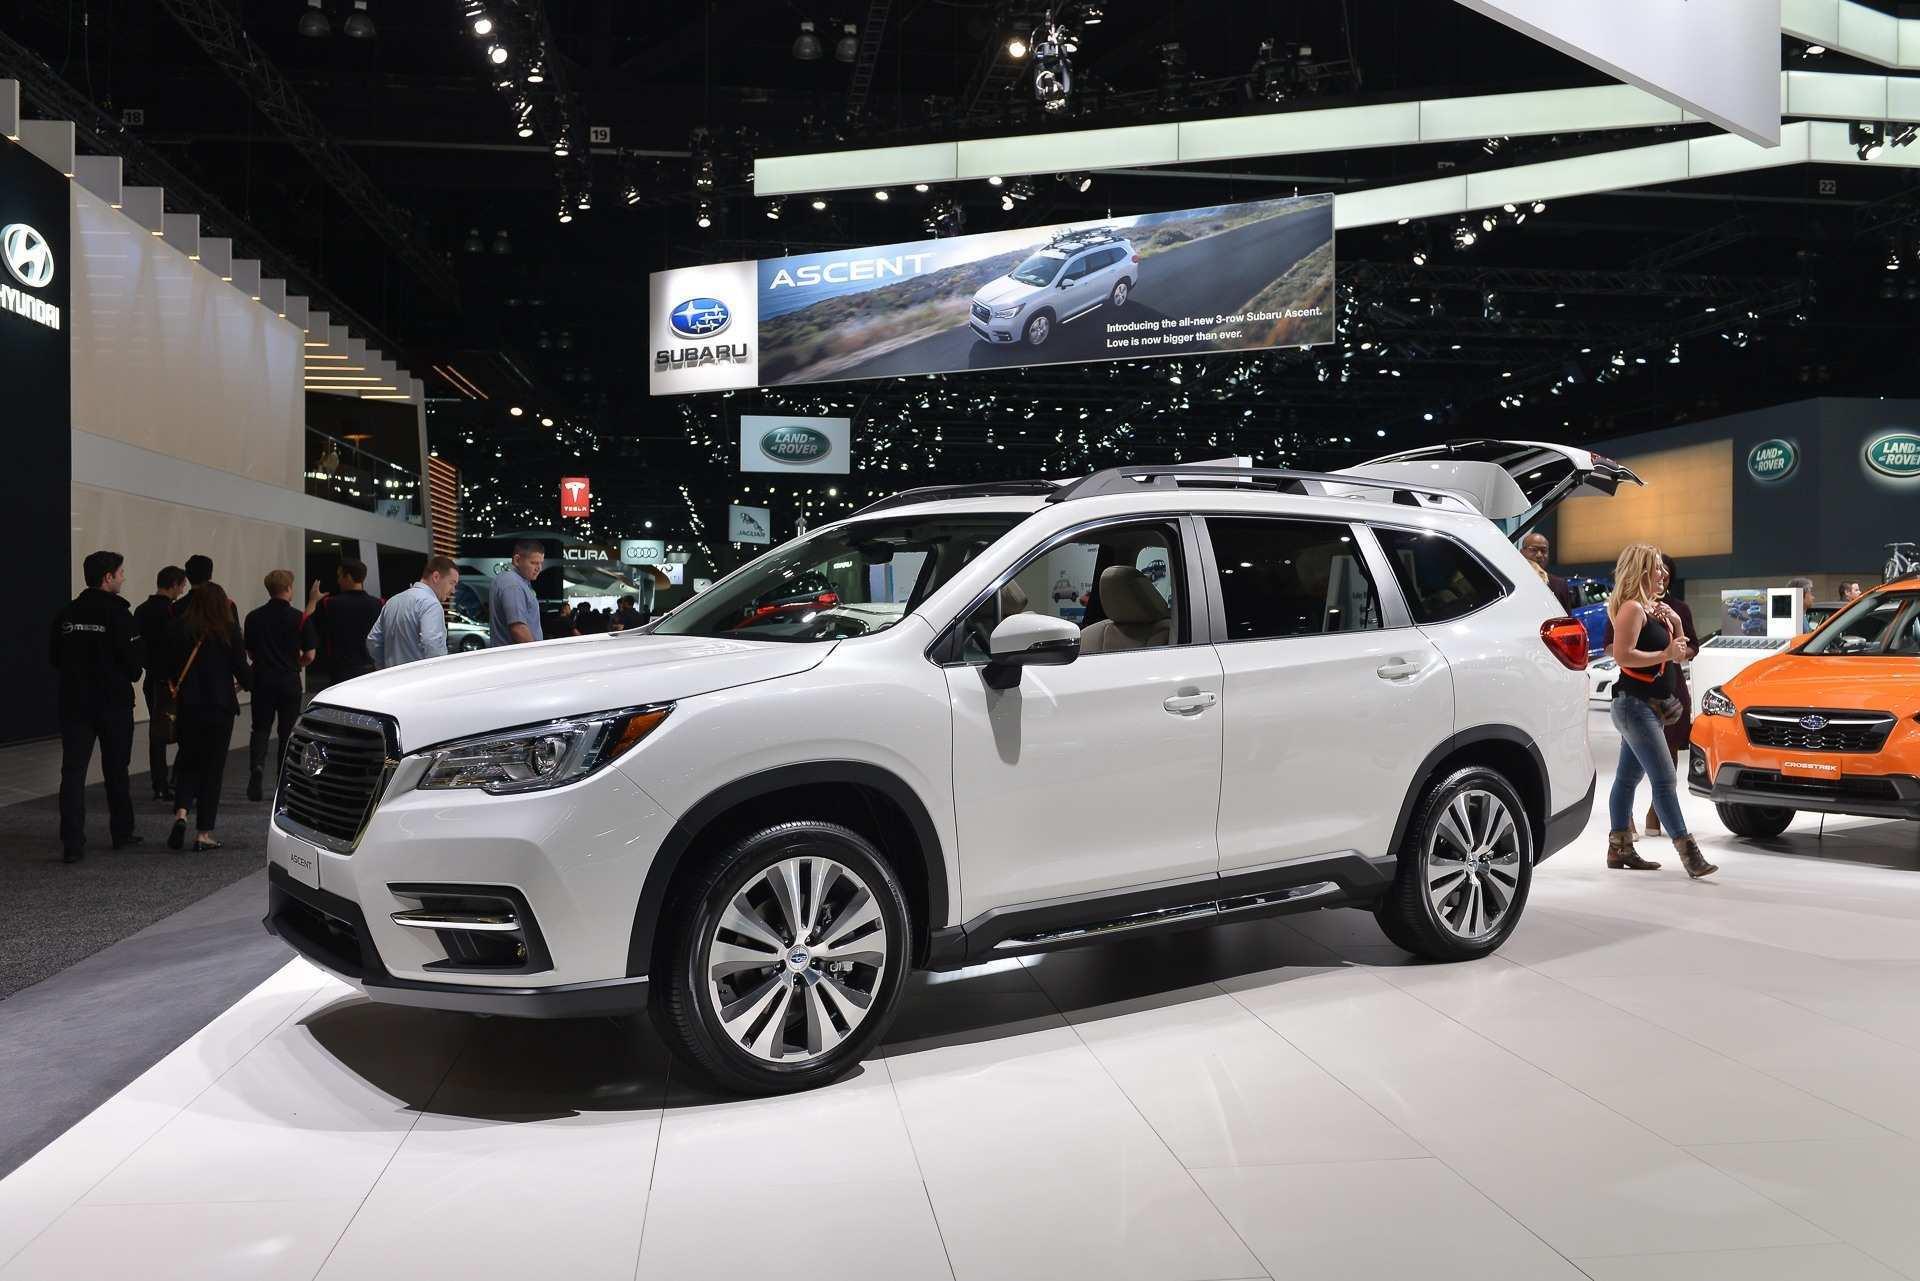 24 Concept of 2019 Subaru Pickup Truck Concept for 2019 Subaru Pickup Truck